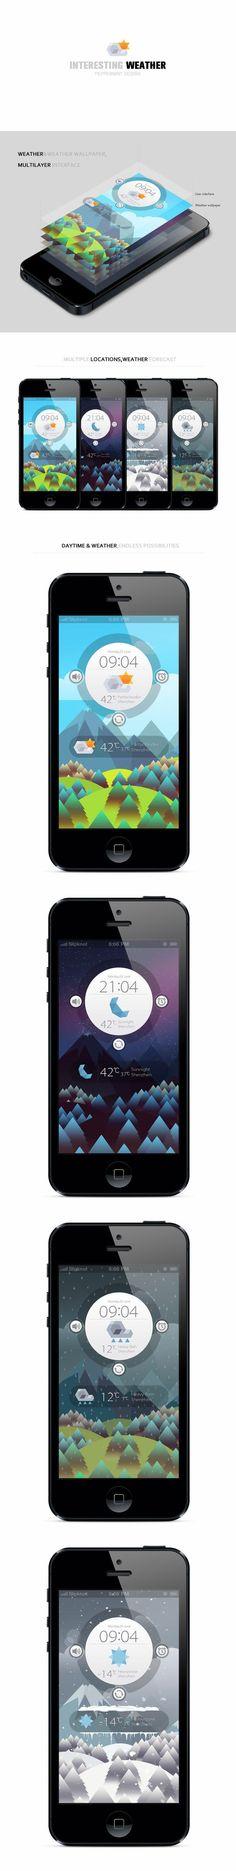 Inspiration Mobile #19 : Applications météo | Blog du Webdesign: